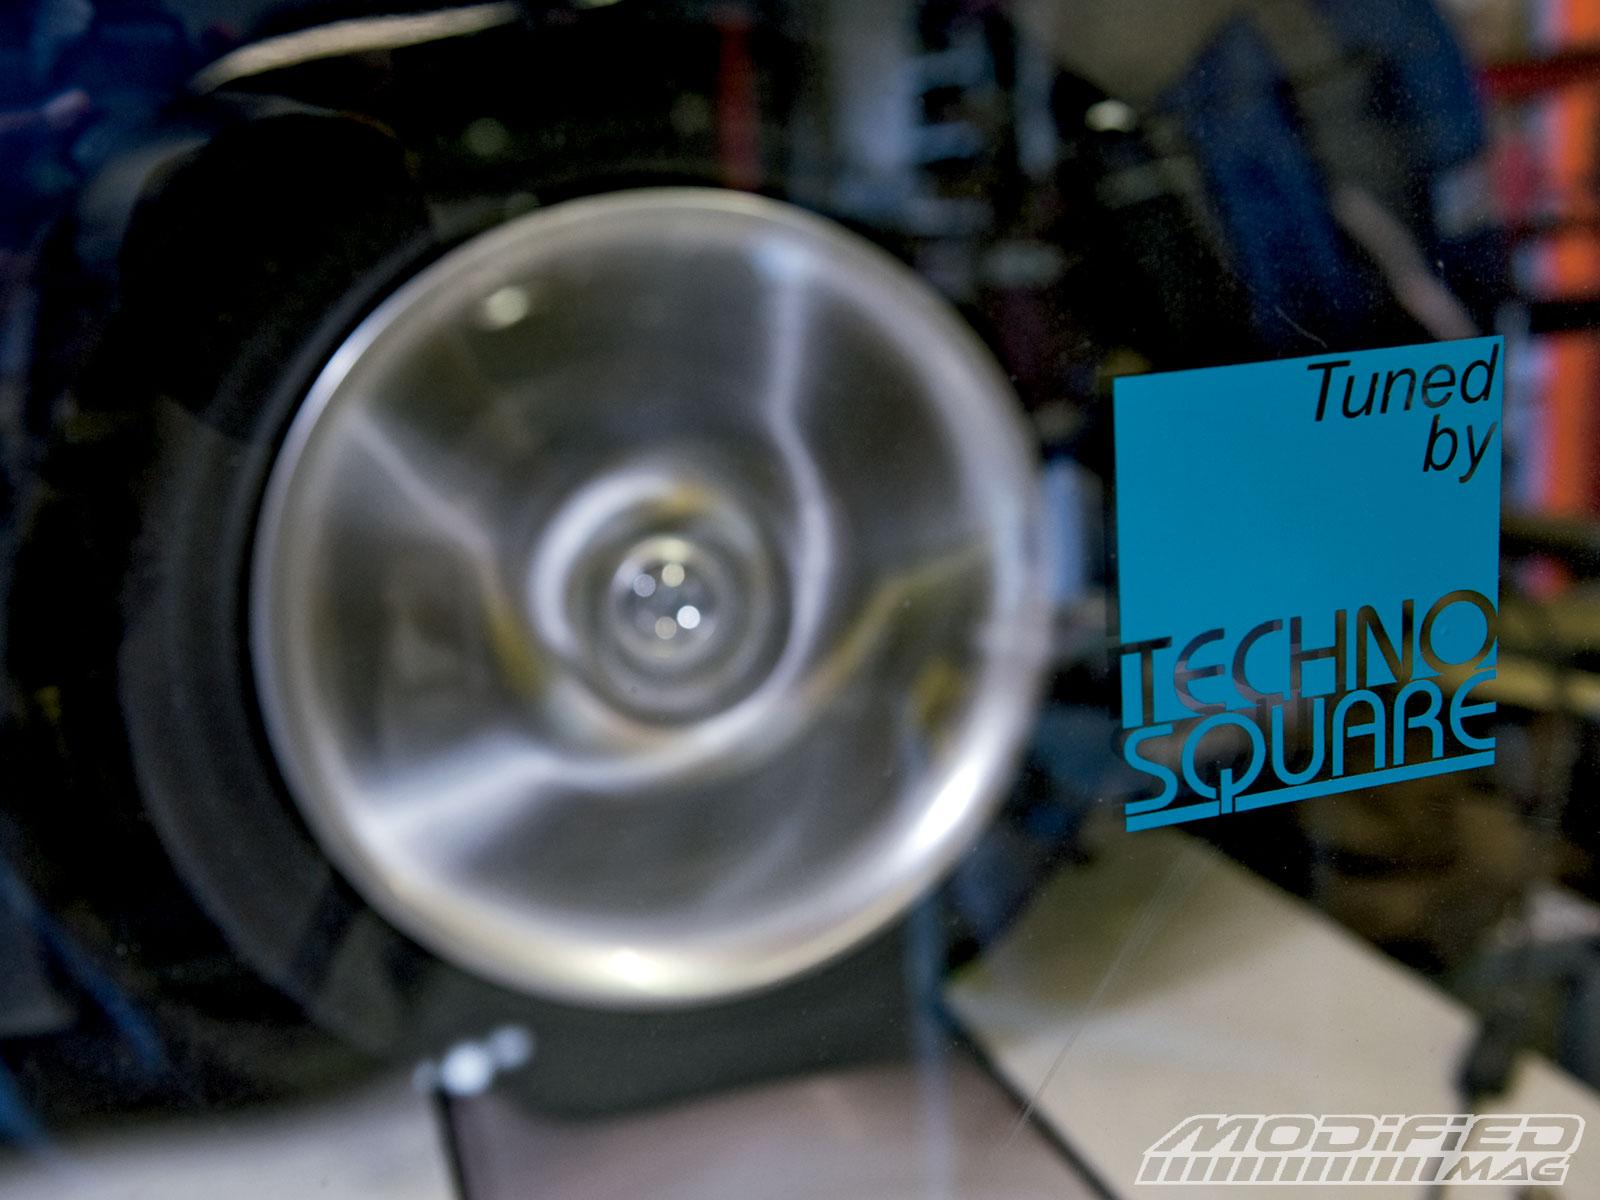 2007 Nissan 350Z - Technosquare ECU Tuning Photo & Image Gallery